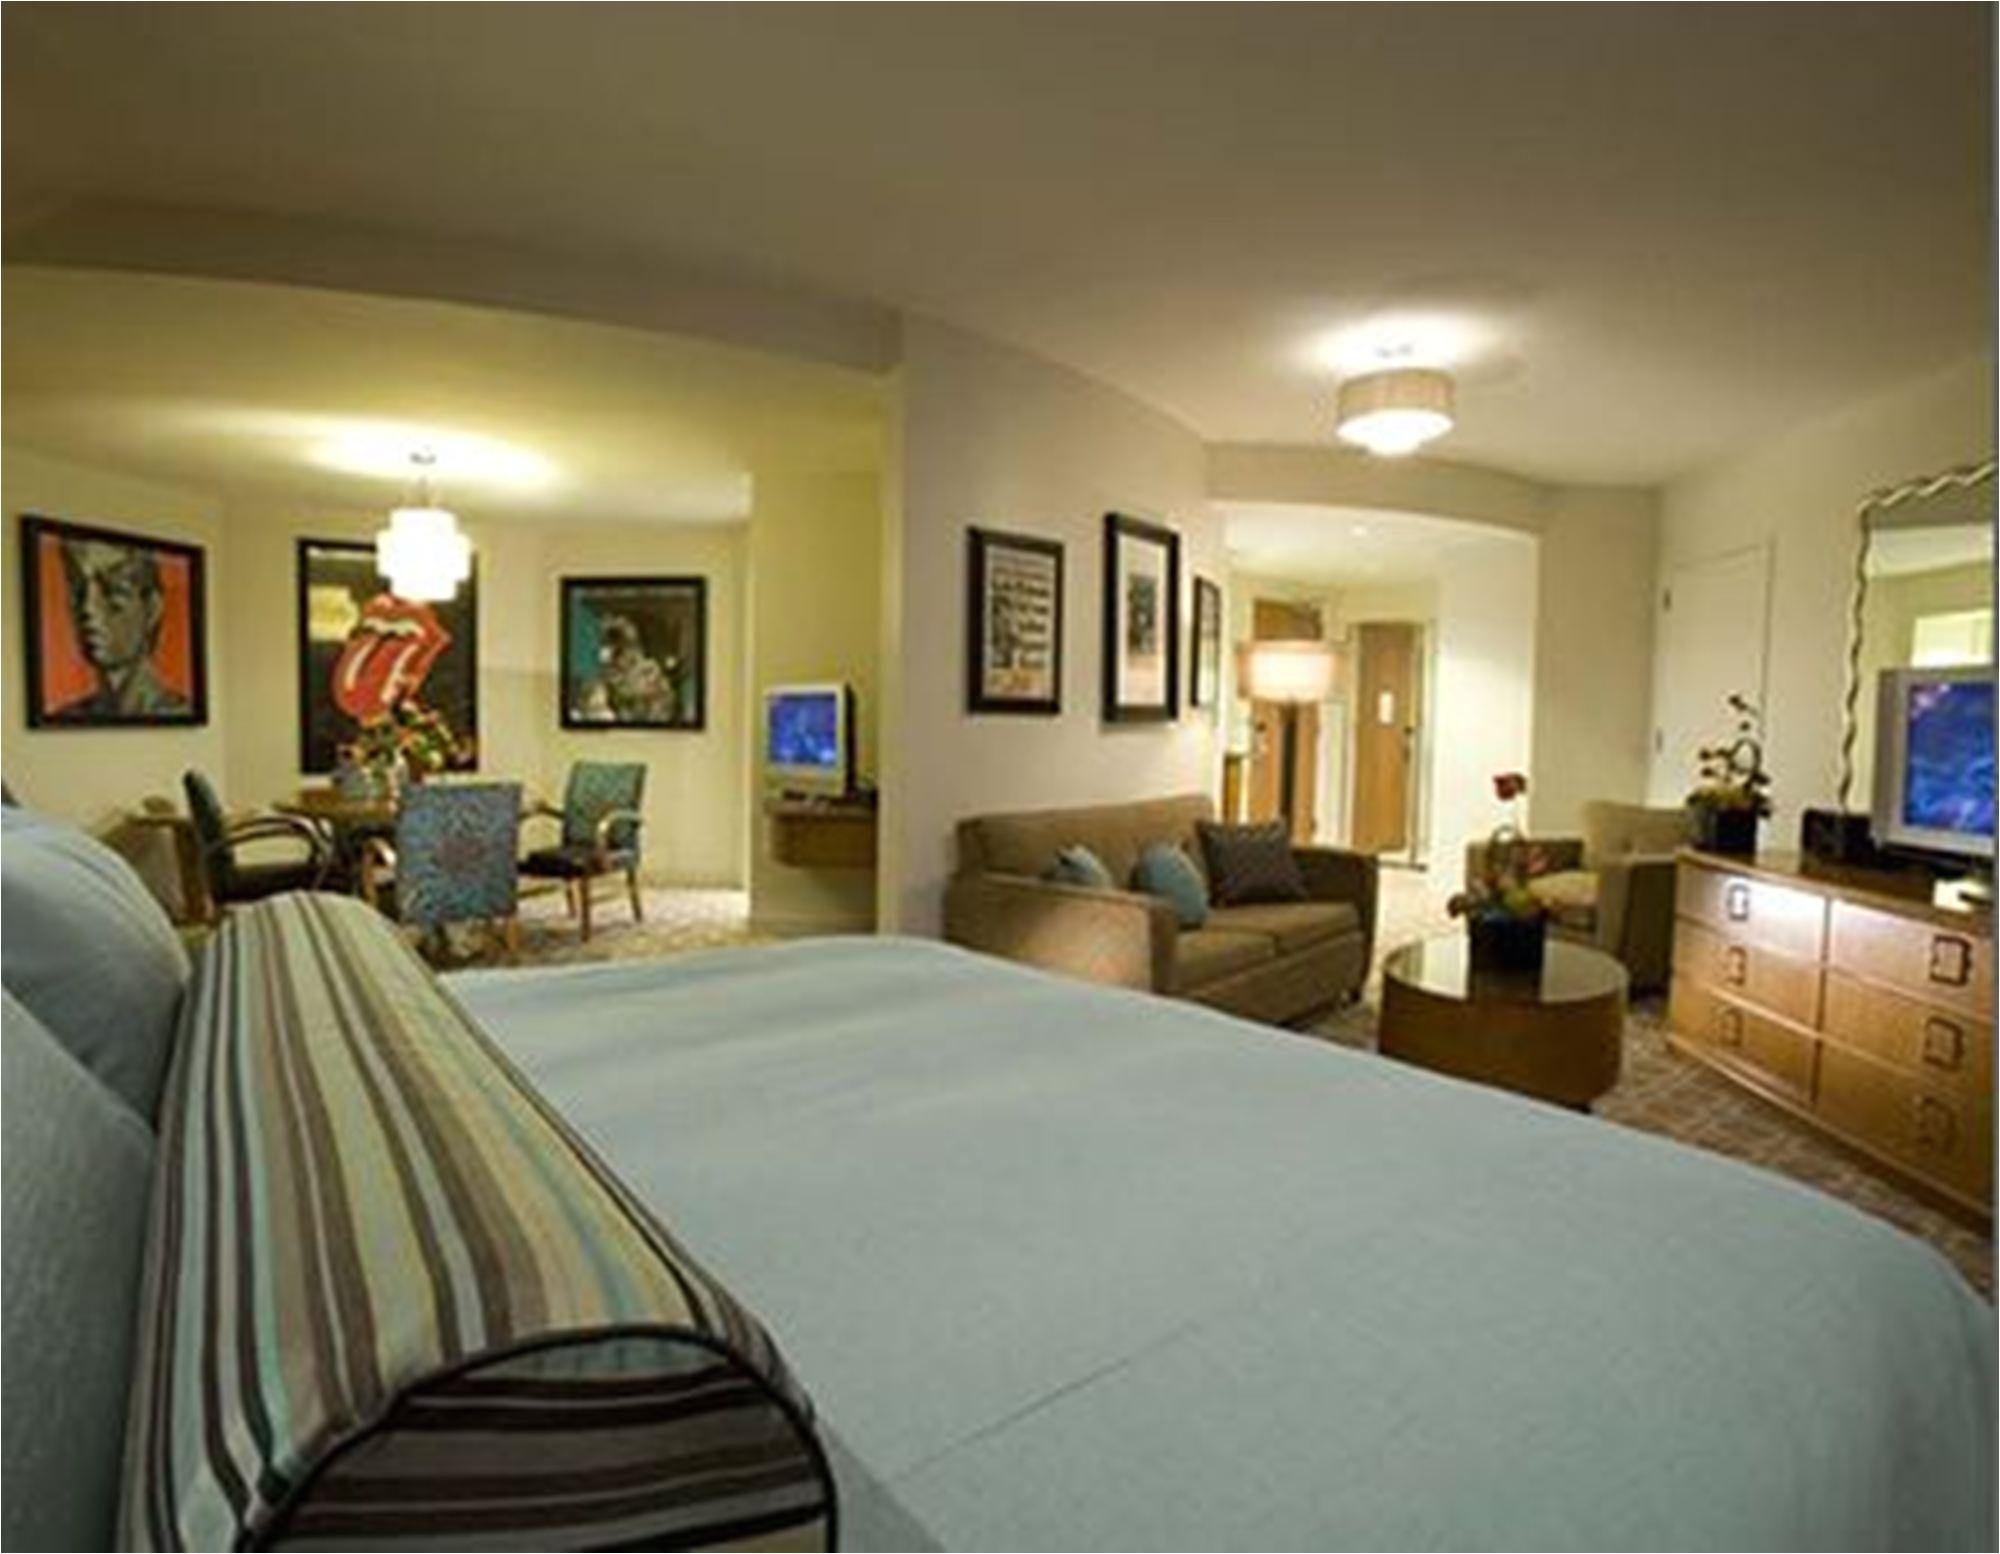 Lovely 2 Bedroom Hotels In Orlando Near Disney Orlando Hotel With Kitchen  Vojnikinfo Homewood Suites Orlando Pictures